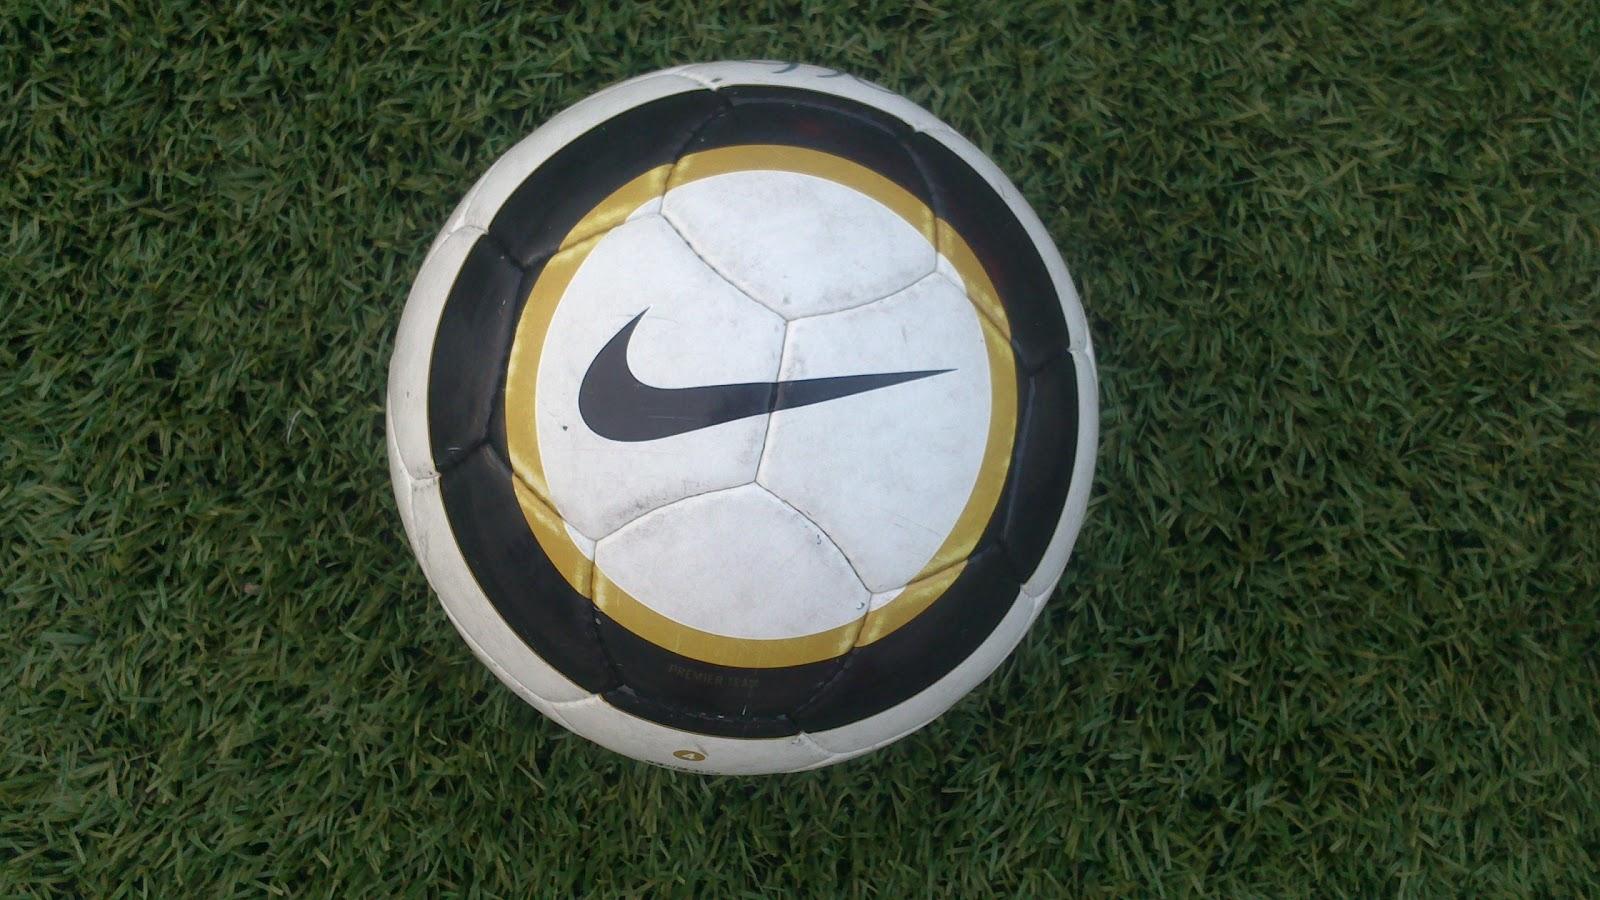 http   www.futbolmanianet.com futbol SC1909129 balon-de-futbol-nike-premier- team-fifa-blanco-dorado-negro orden  page 1 c345aac47604c